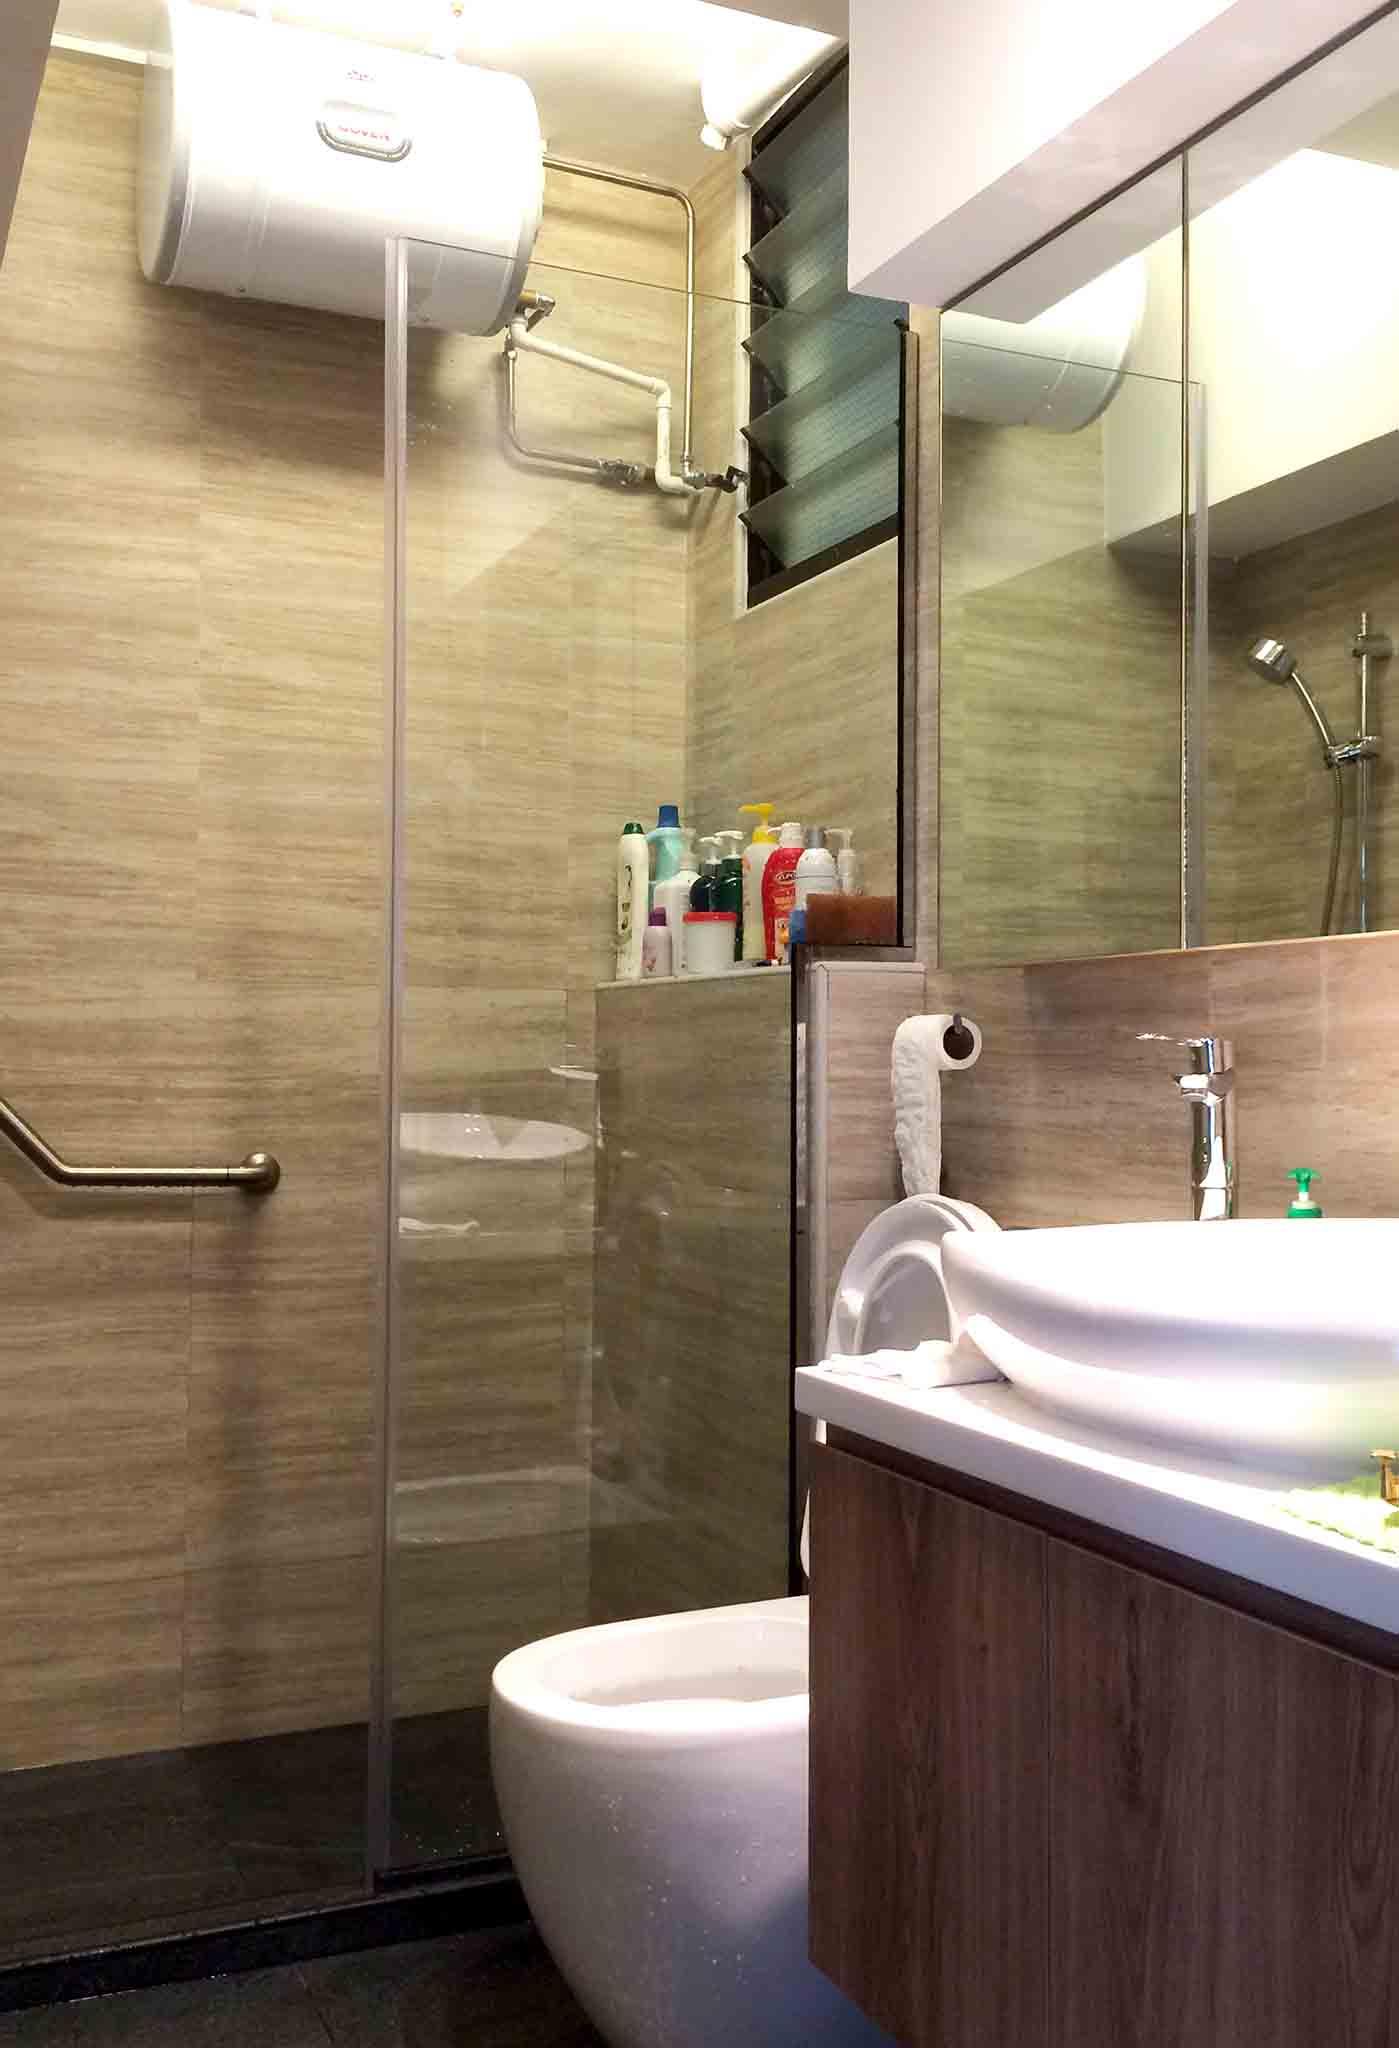 Bedroom Interior Design Package